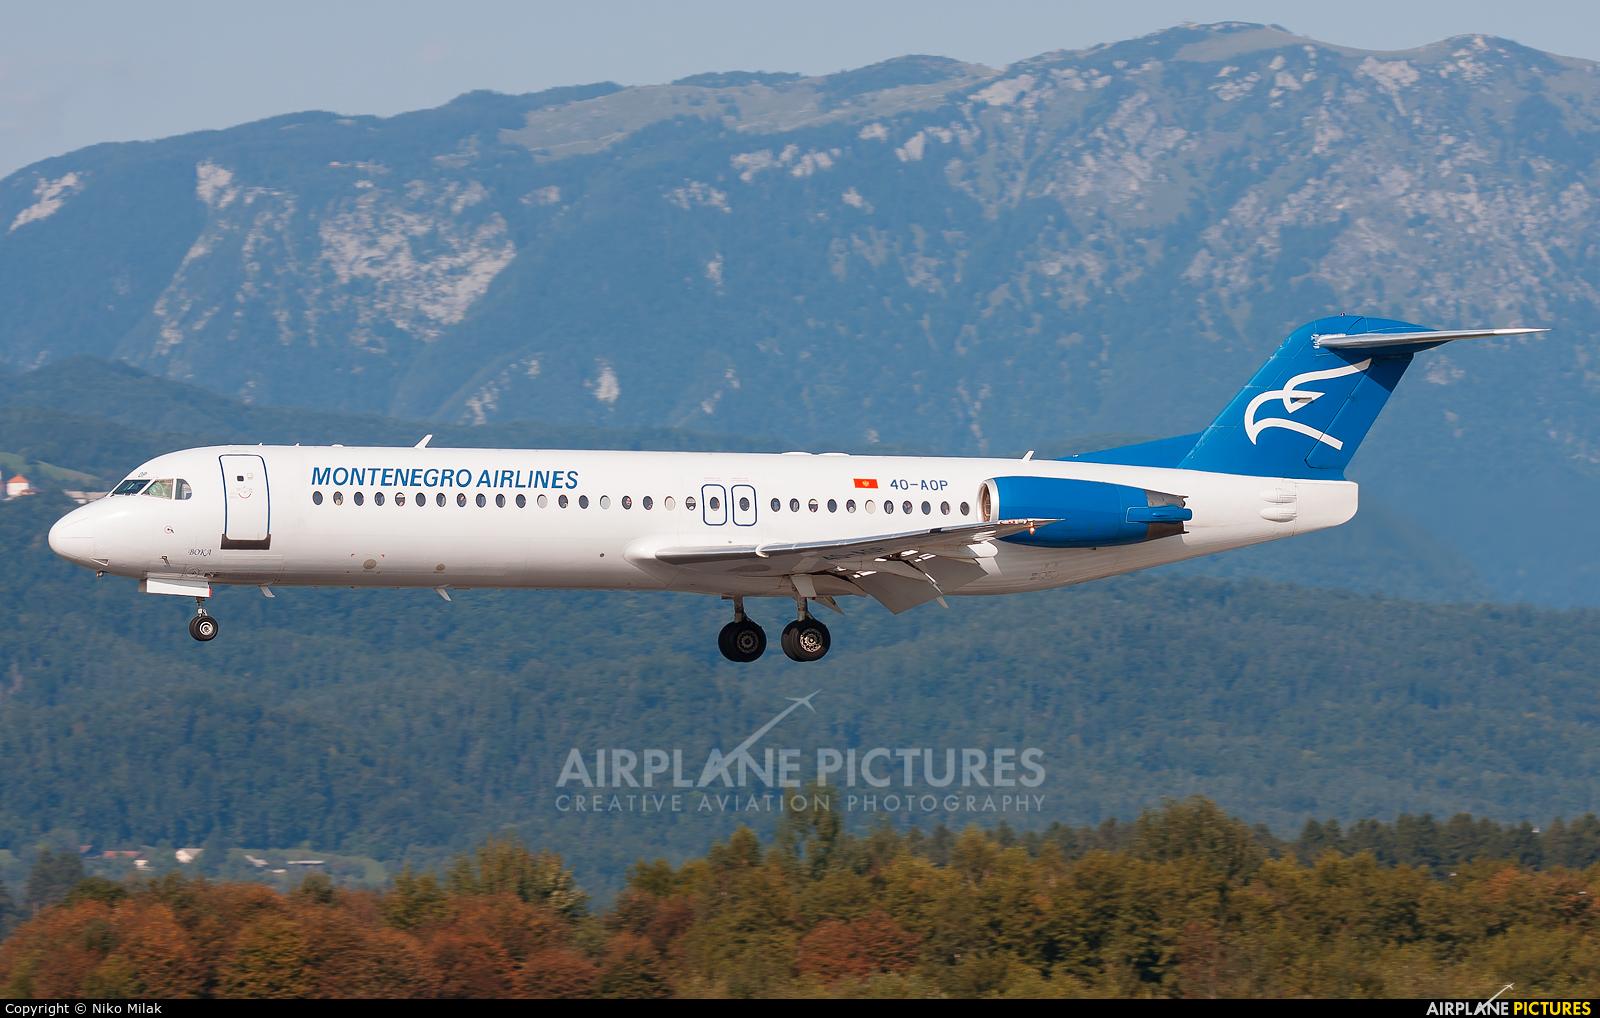 Montenegro Airlines 4O-AOP aircraft at Ljubljana - Brnik